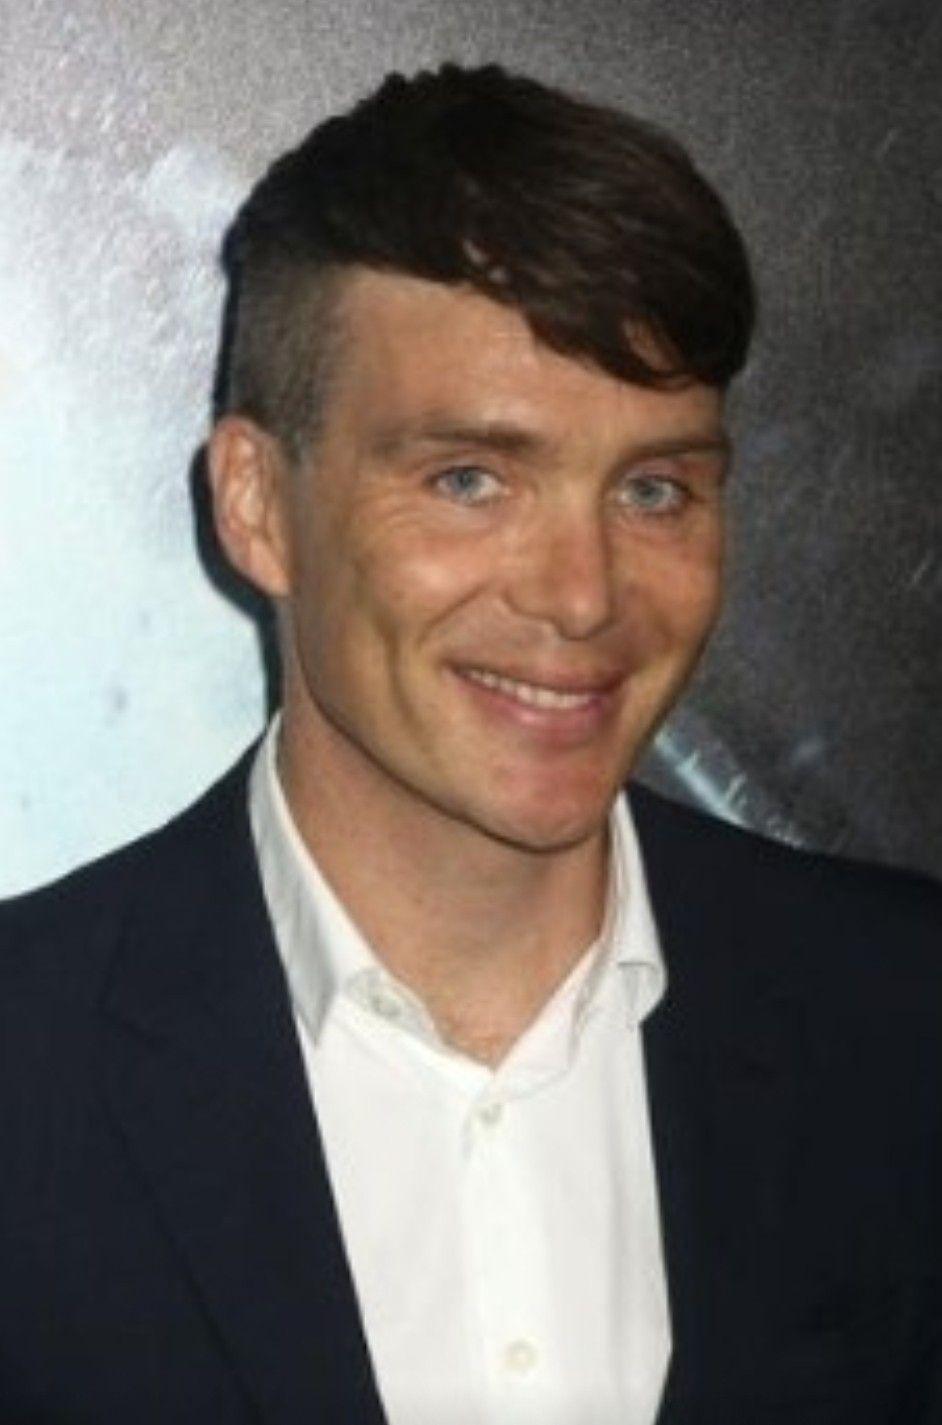 Cillian Murphy aka Mr Peaky Blinders at the premiere of ...